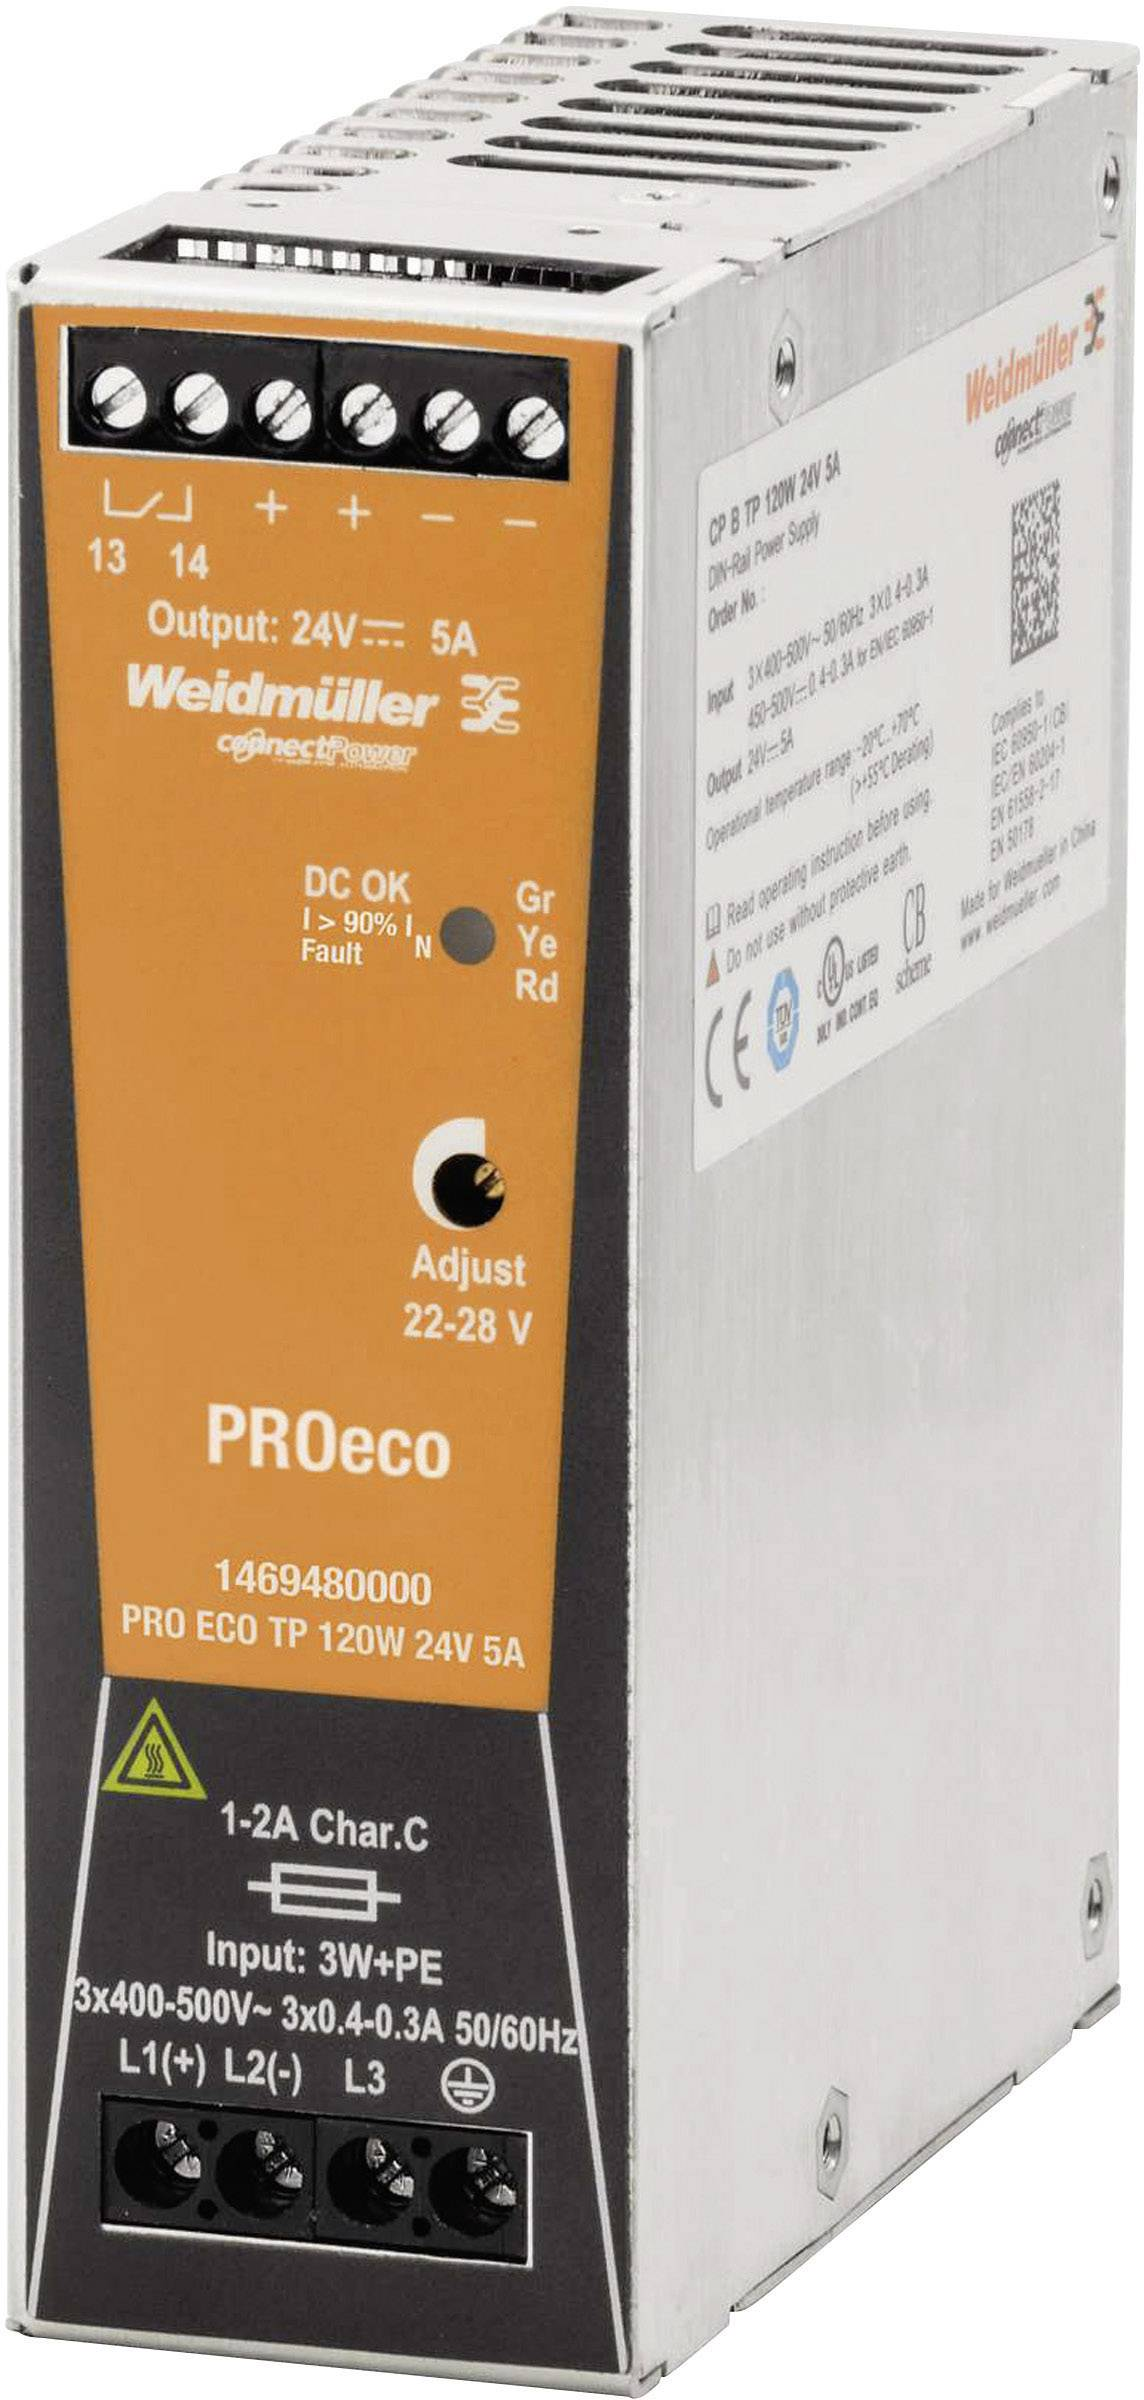 Síťový zdroj na DIN lištu Weidmüller PRO ECO 120W 24V 5A, 1 x, 24 V/DC, 5 A, 120 W